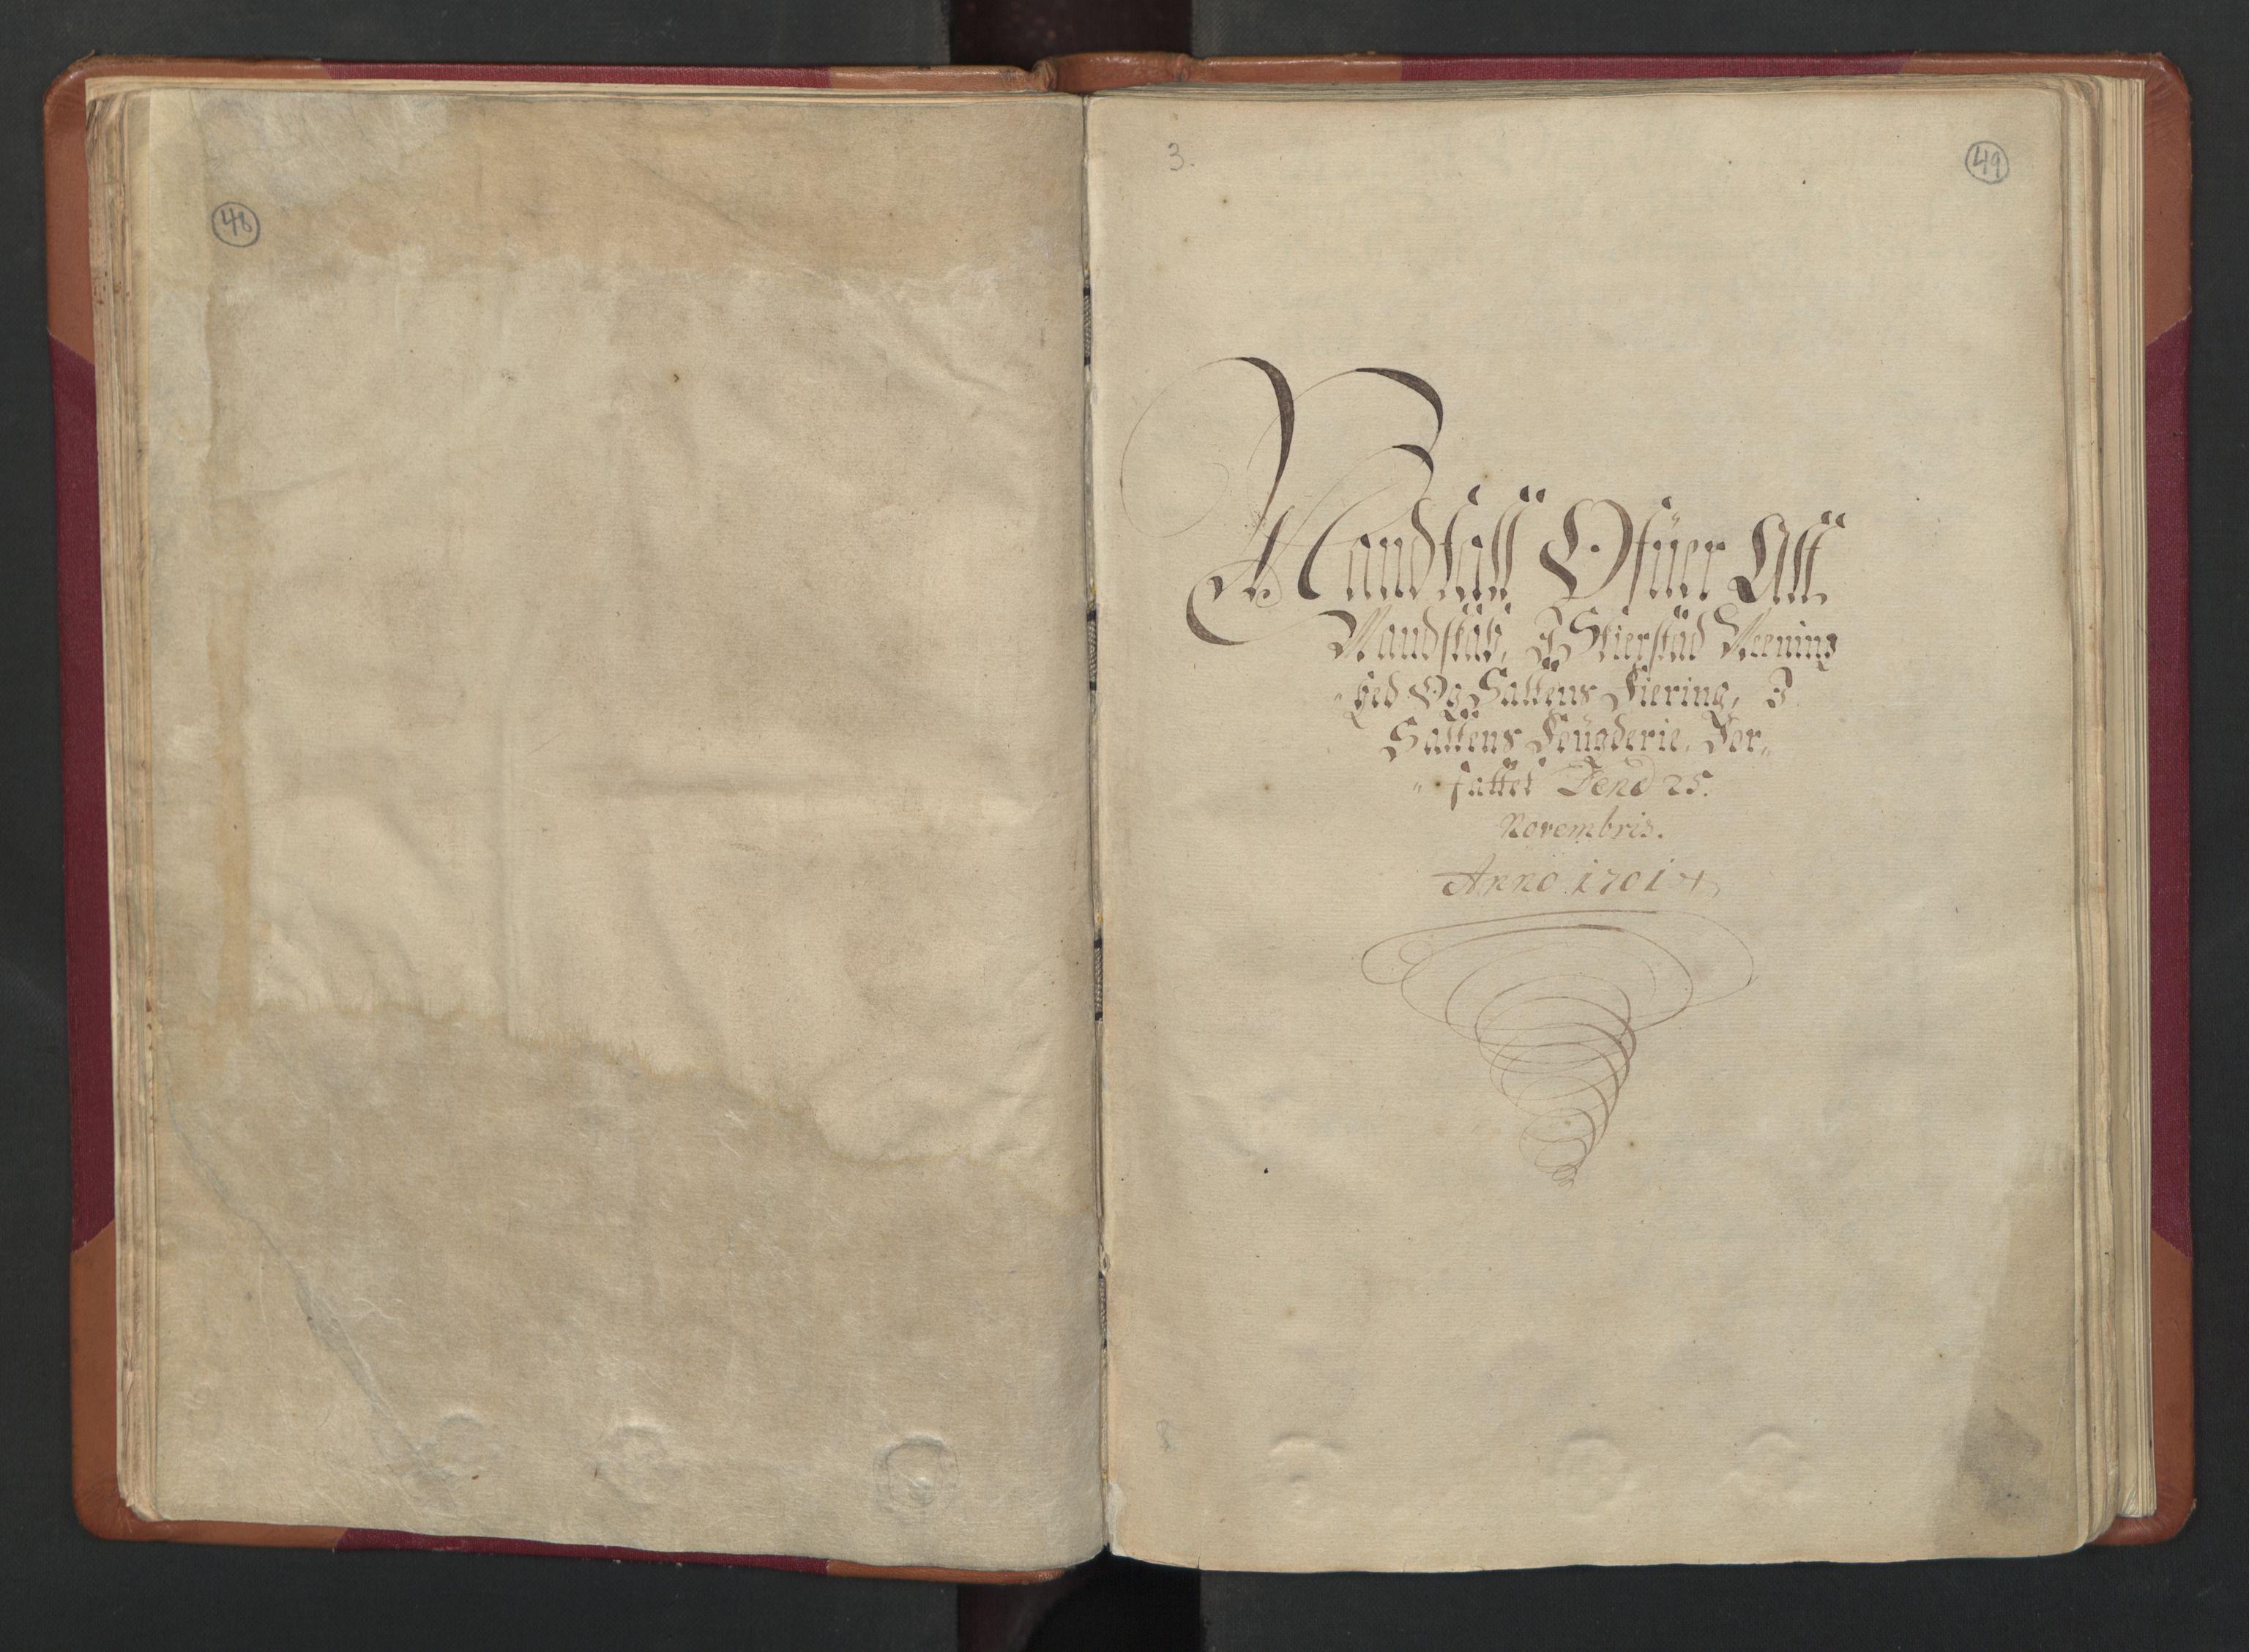 RA, Manntallet 1701, nr. 17: Salten fogderi, 1701, s. 48-49